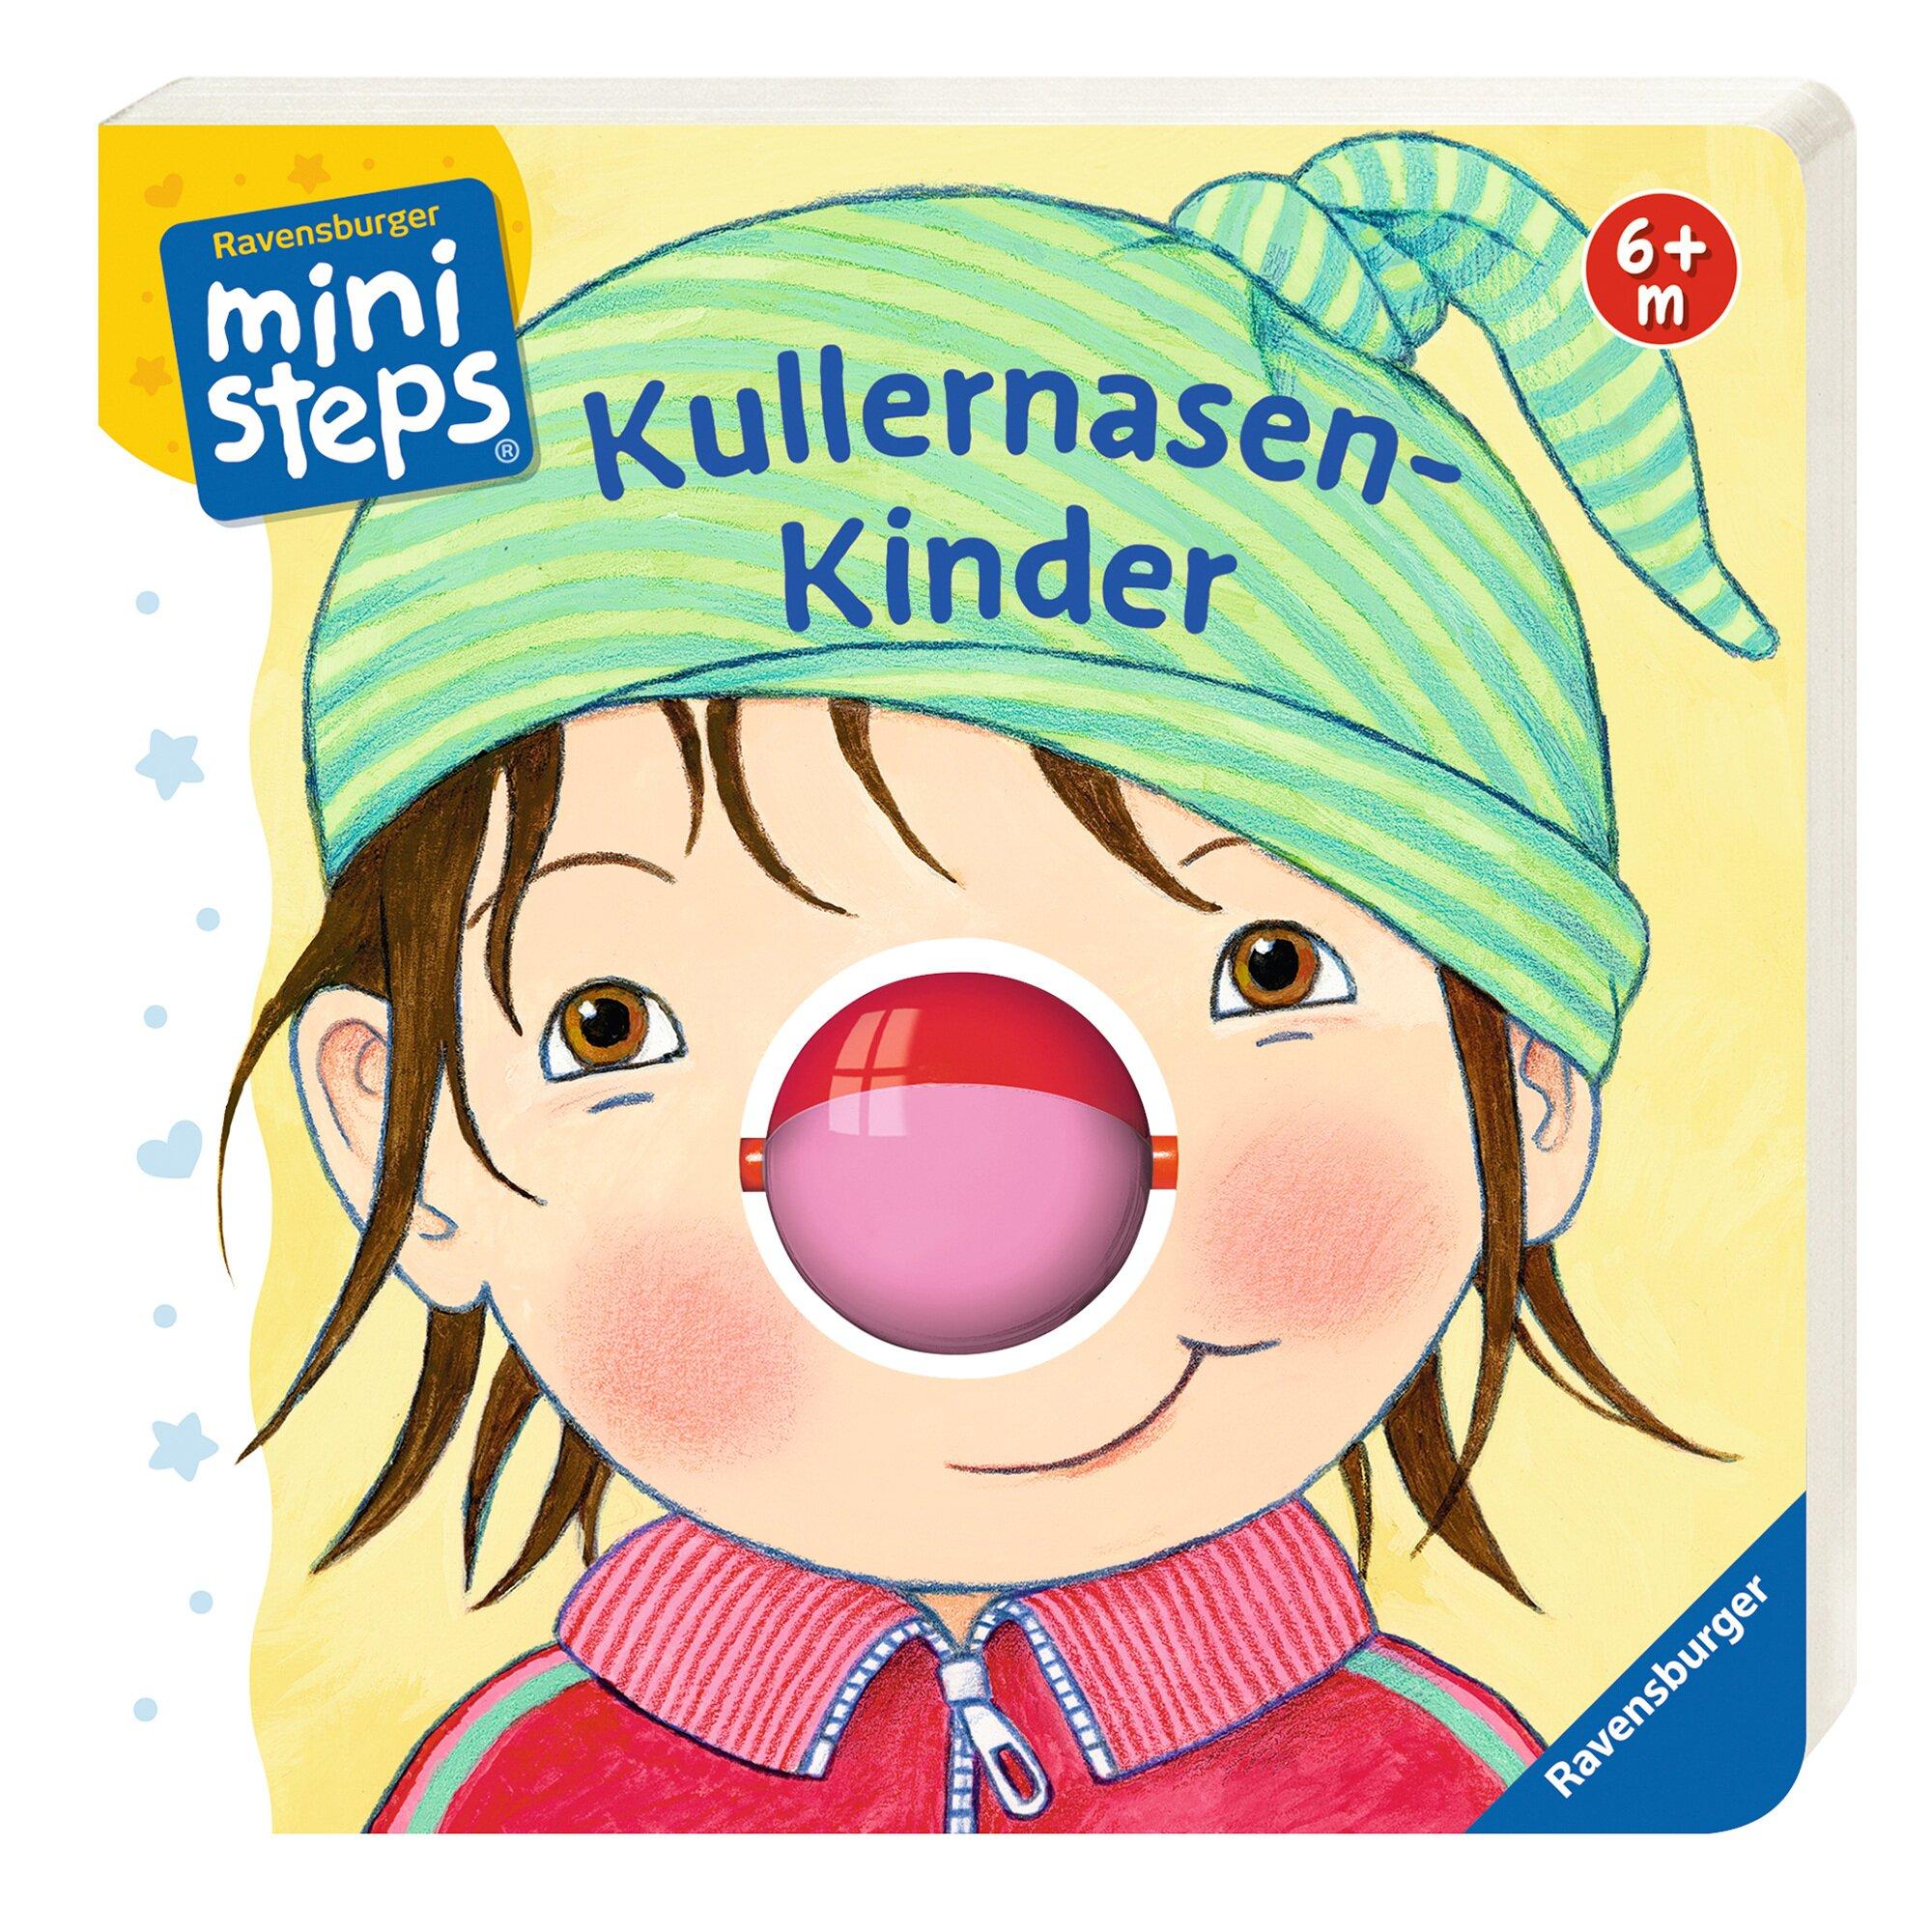 Ministeps Fühlbuch Kullernasen-Kinder